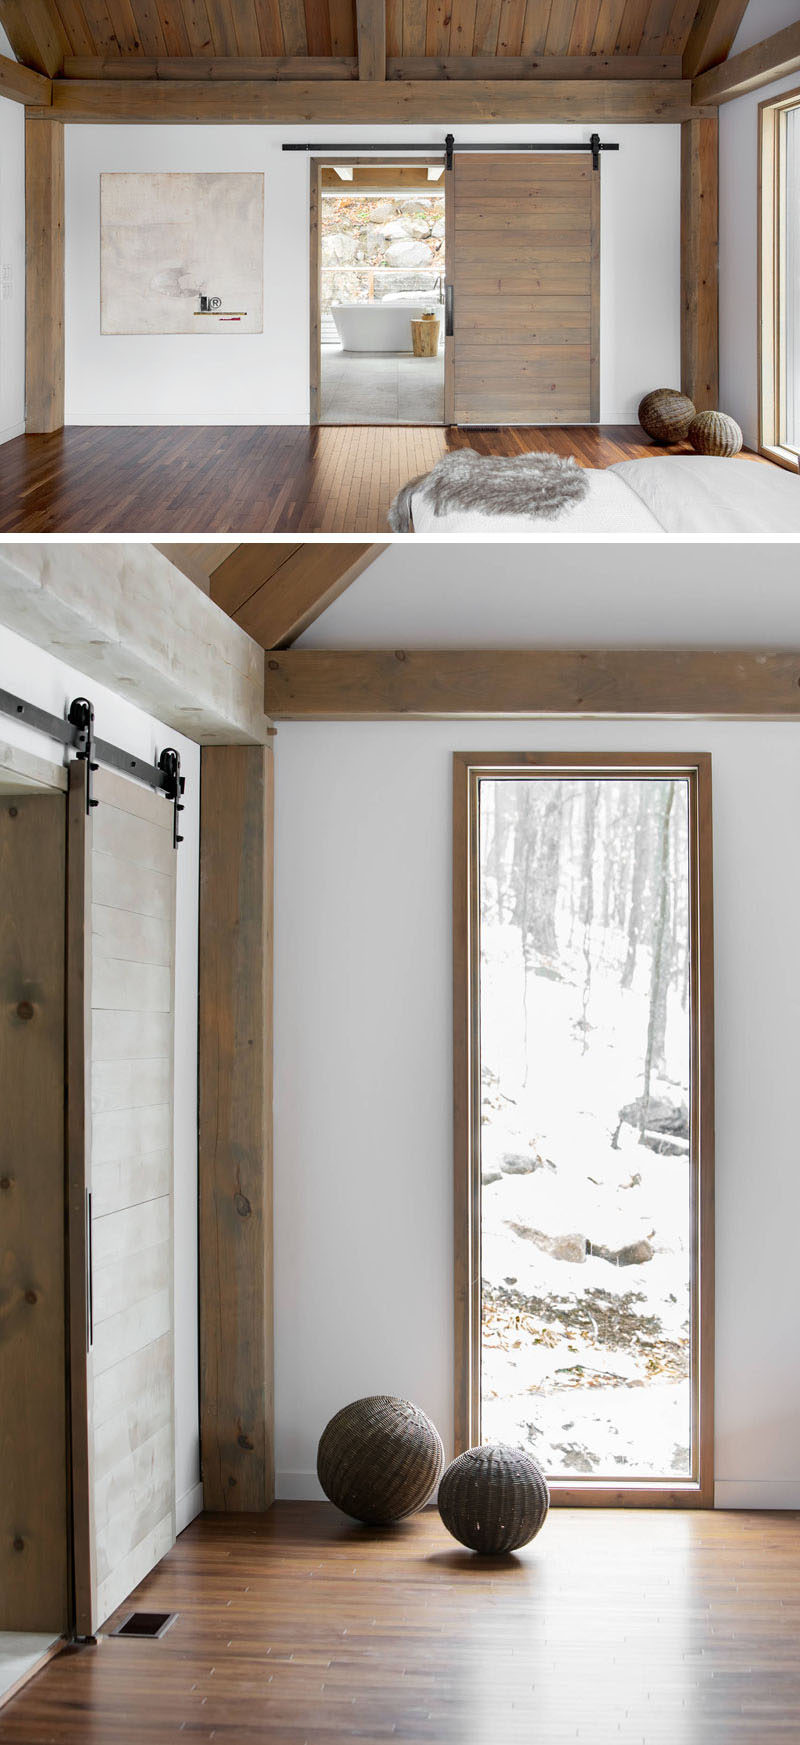 Bedroom Design Ideas This Cozy Barn Inspired Bedroom